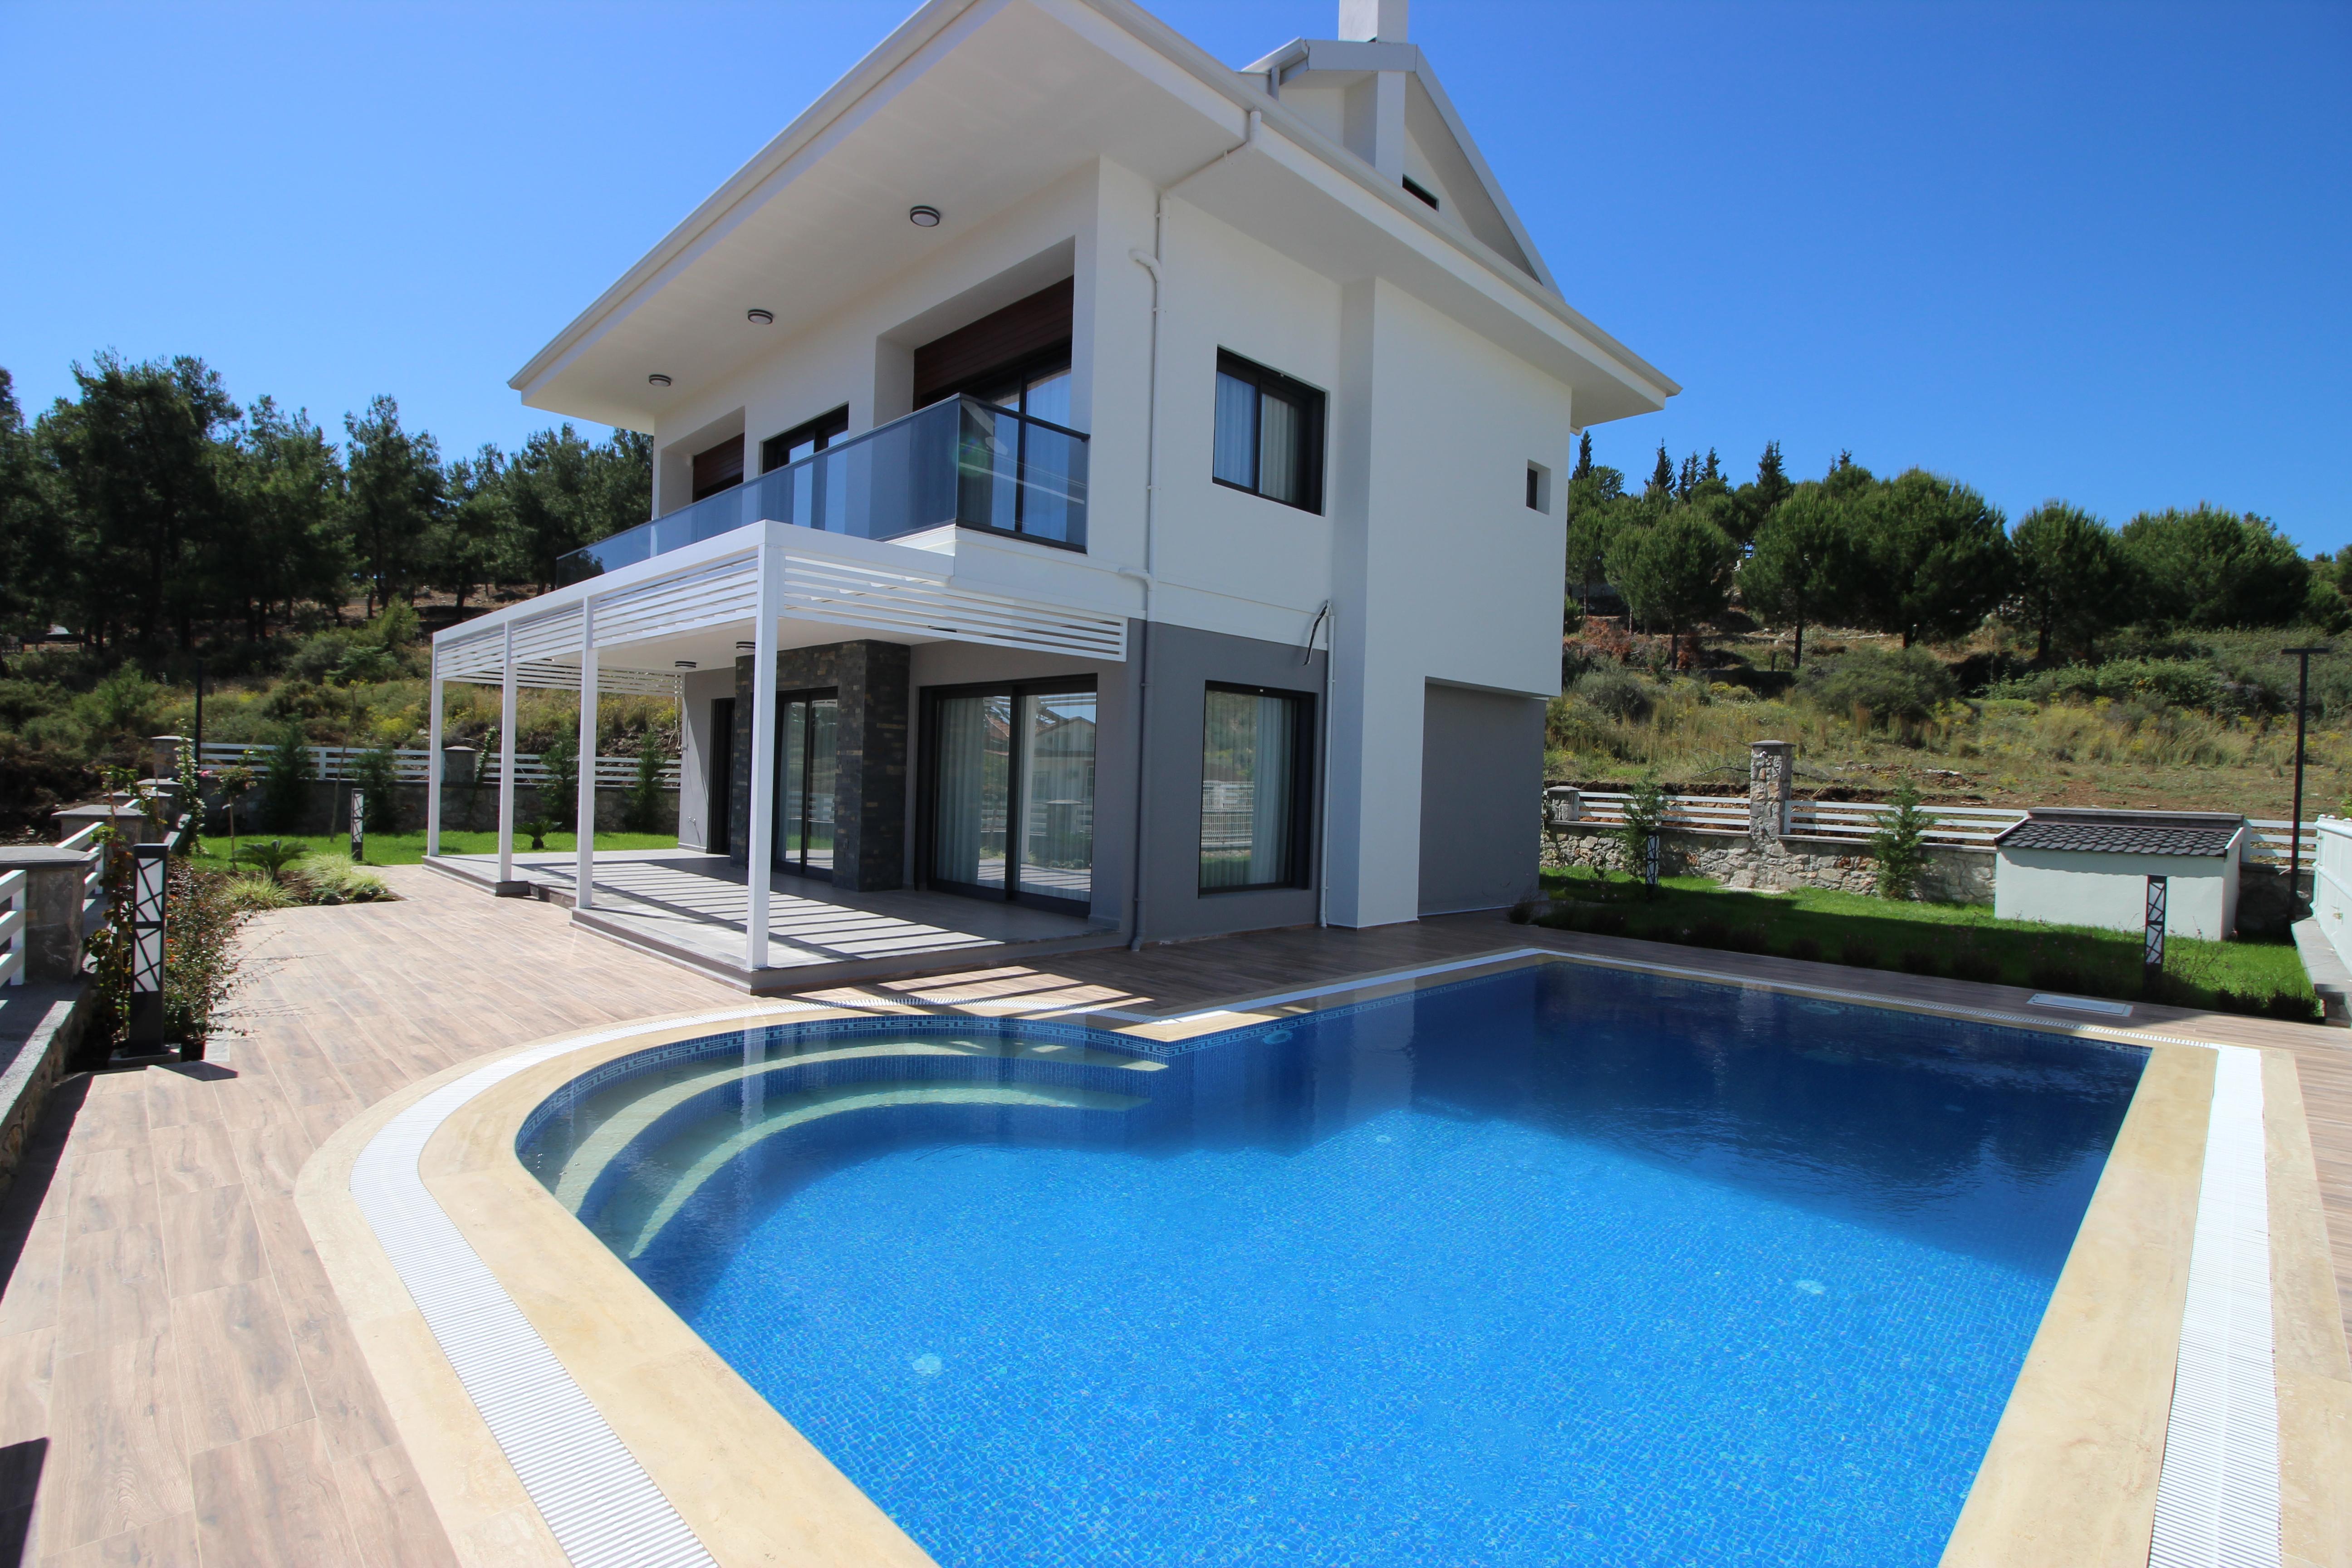 Körfez Garden Villa